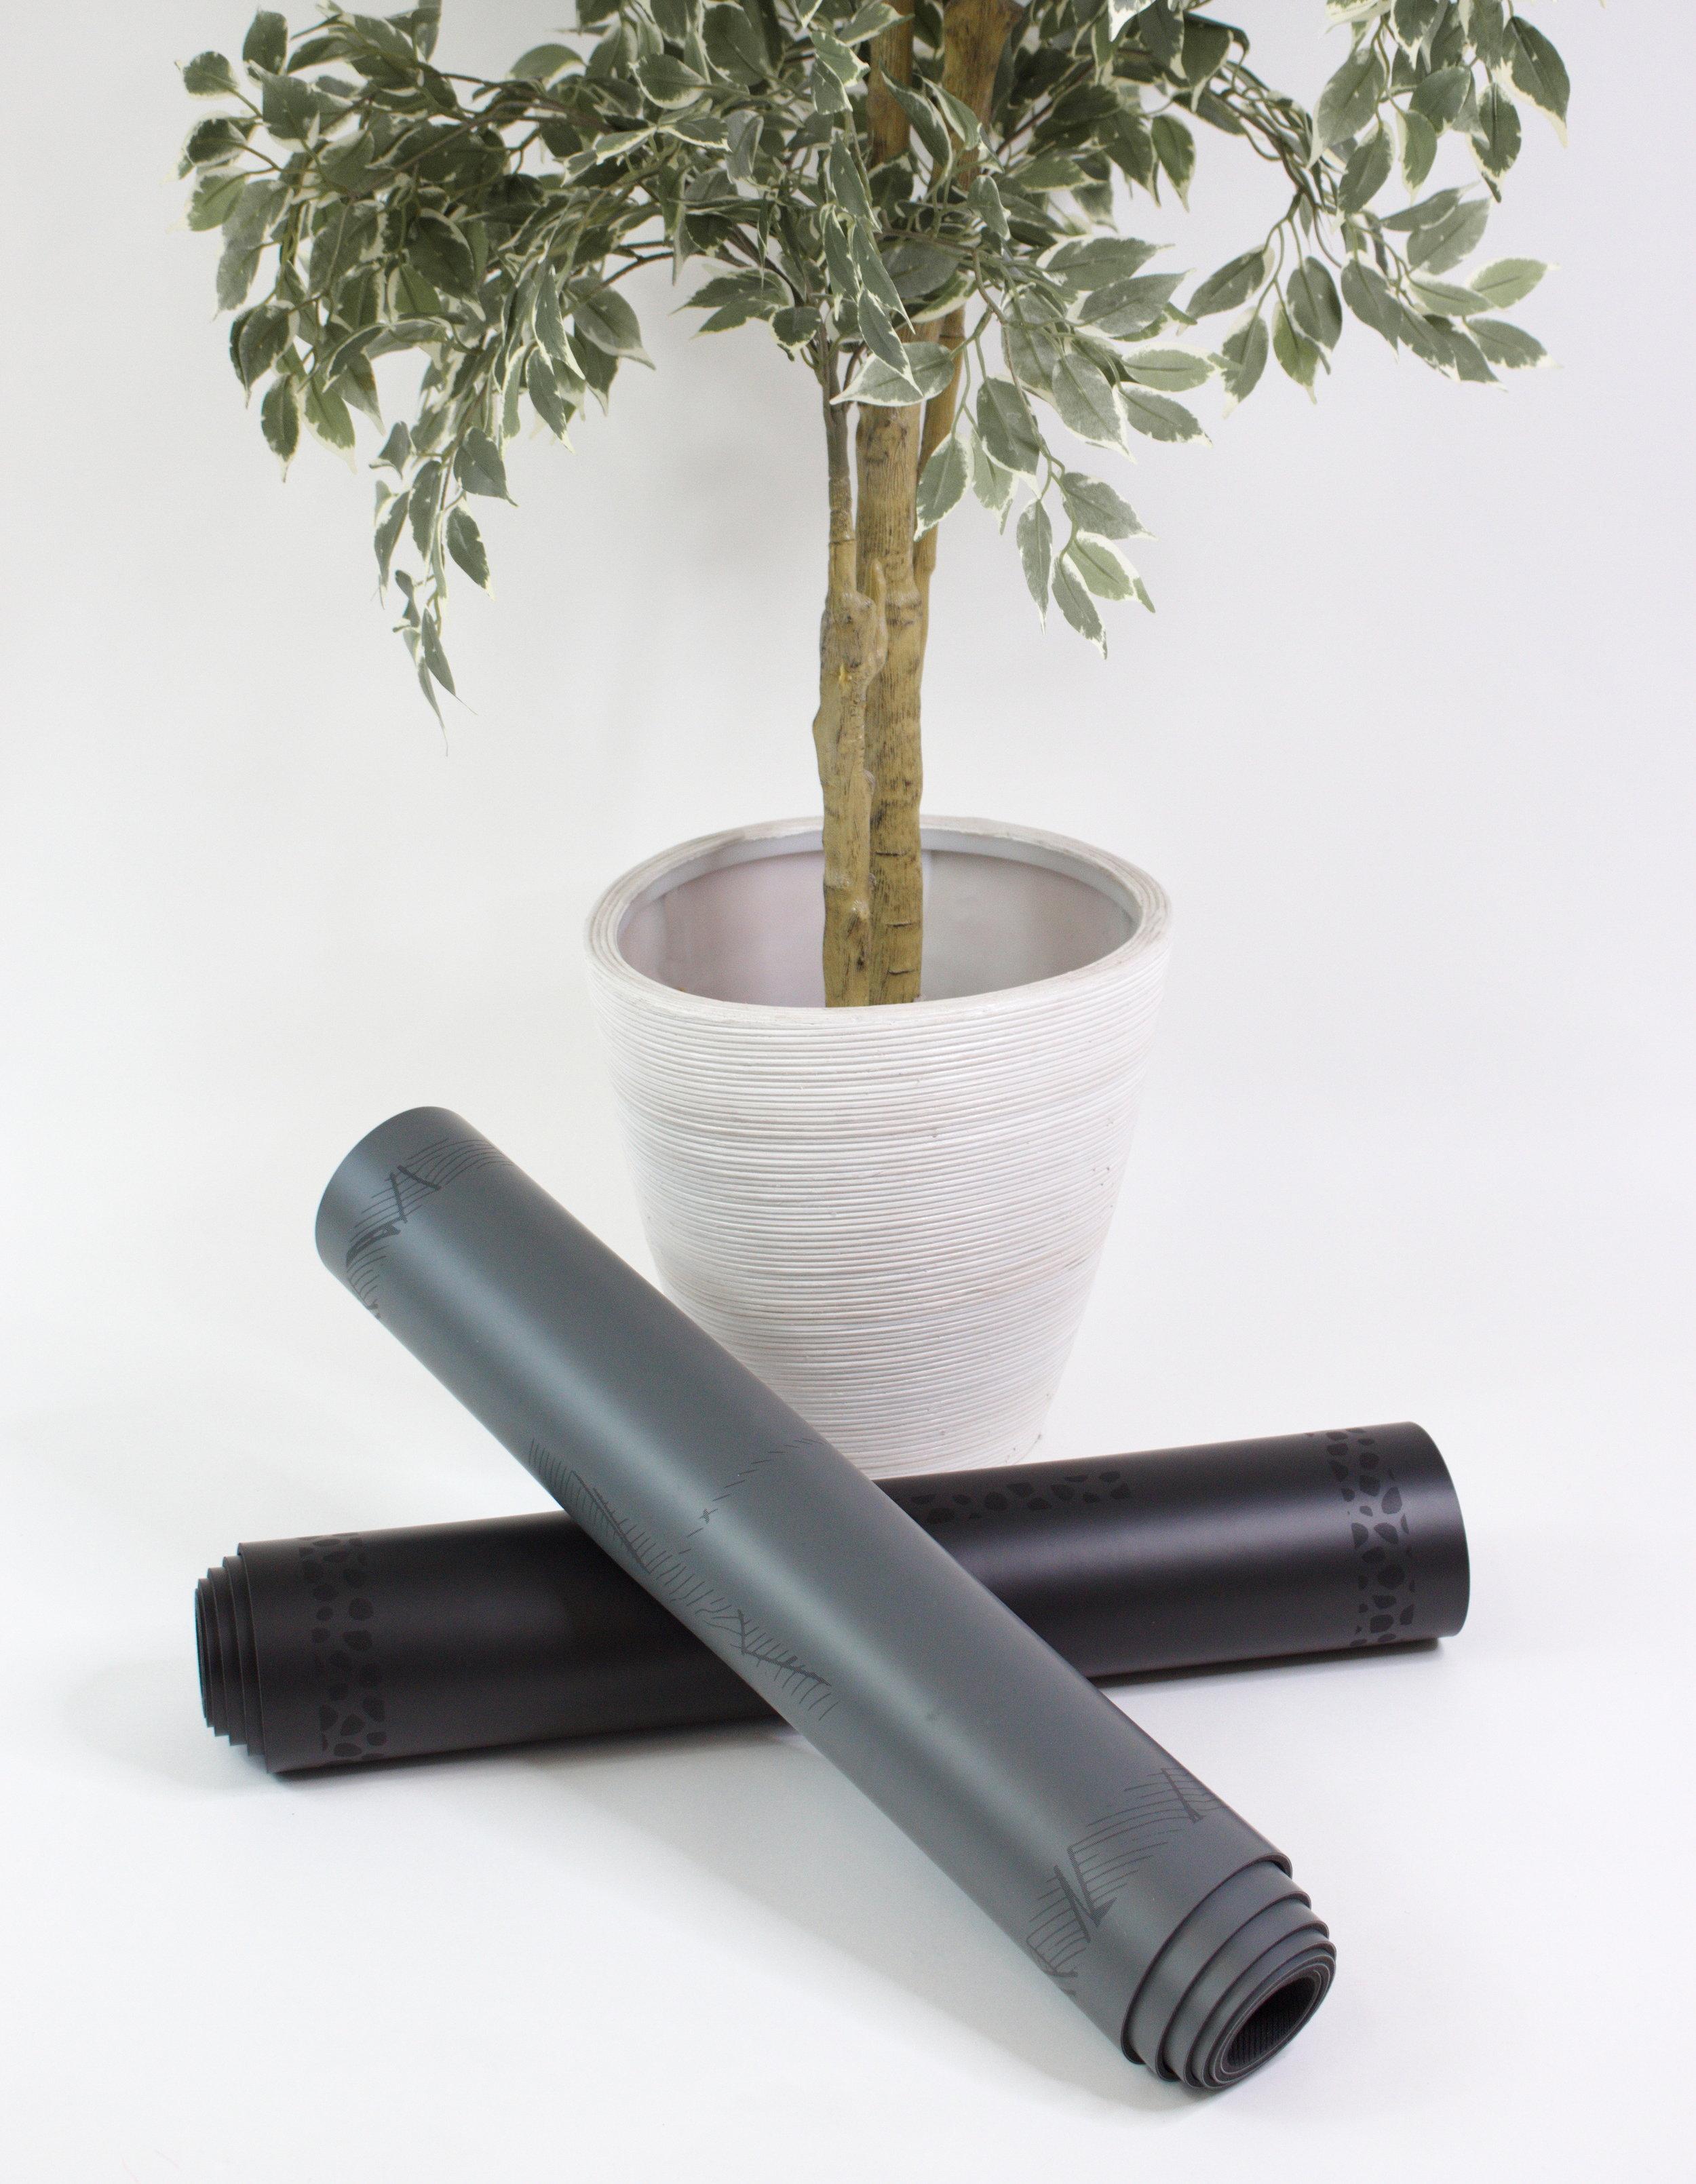 Environmentally friendly Yoga mat